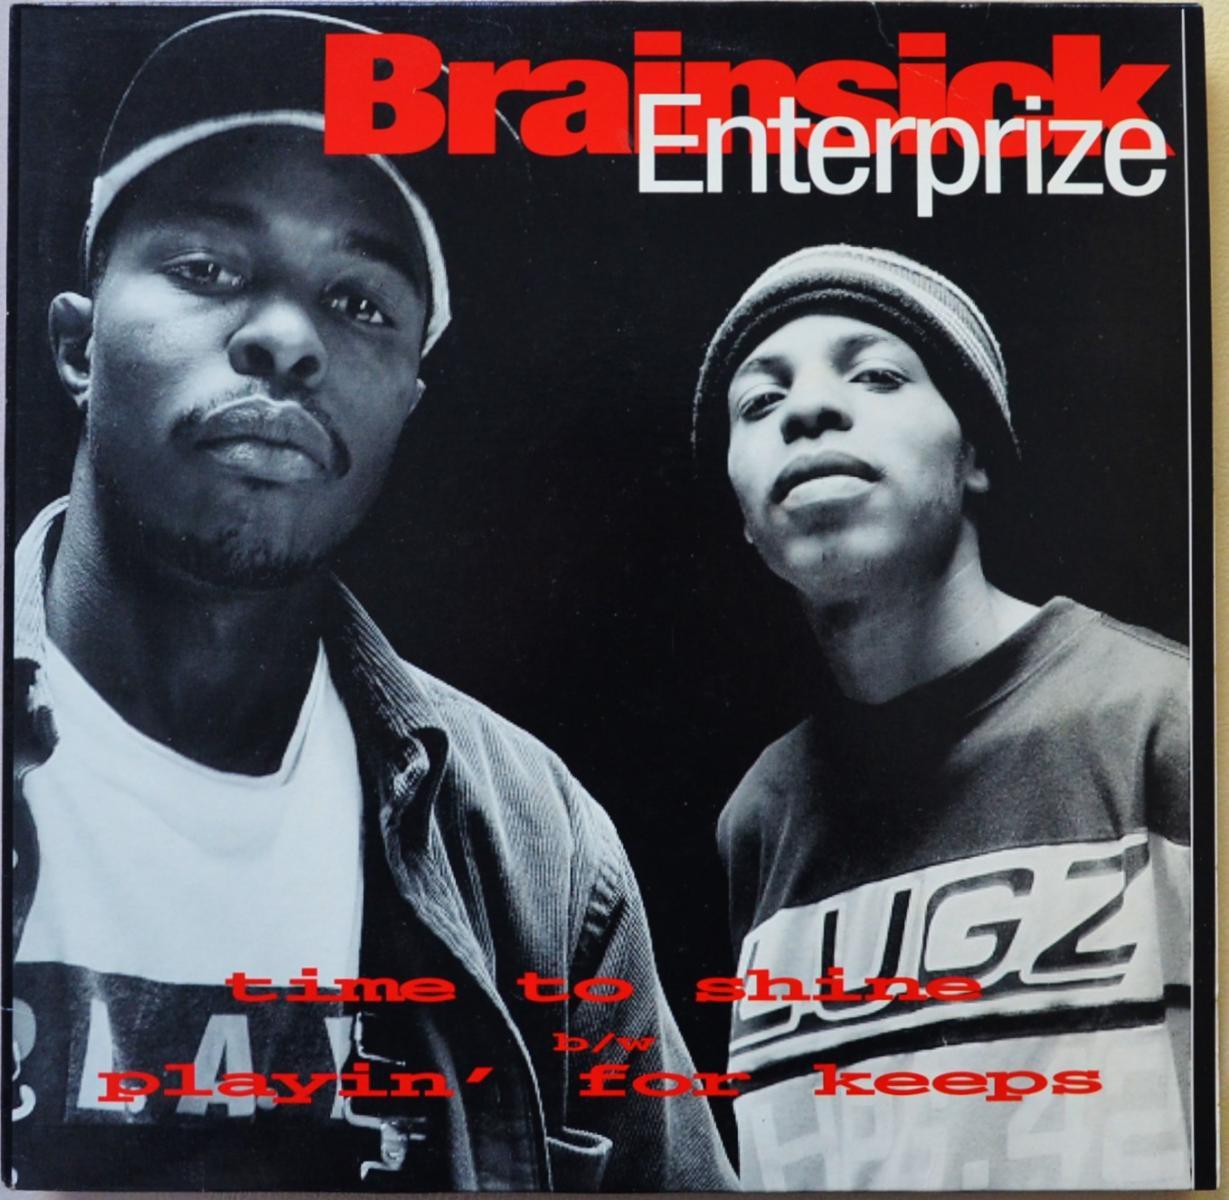 BRAINSICK ENTERPRIZE / TIME TO SHINE / PLAYIN' FOR KEEPS (12